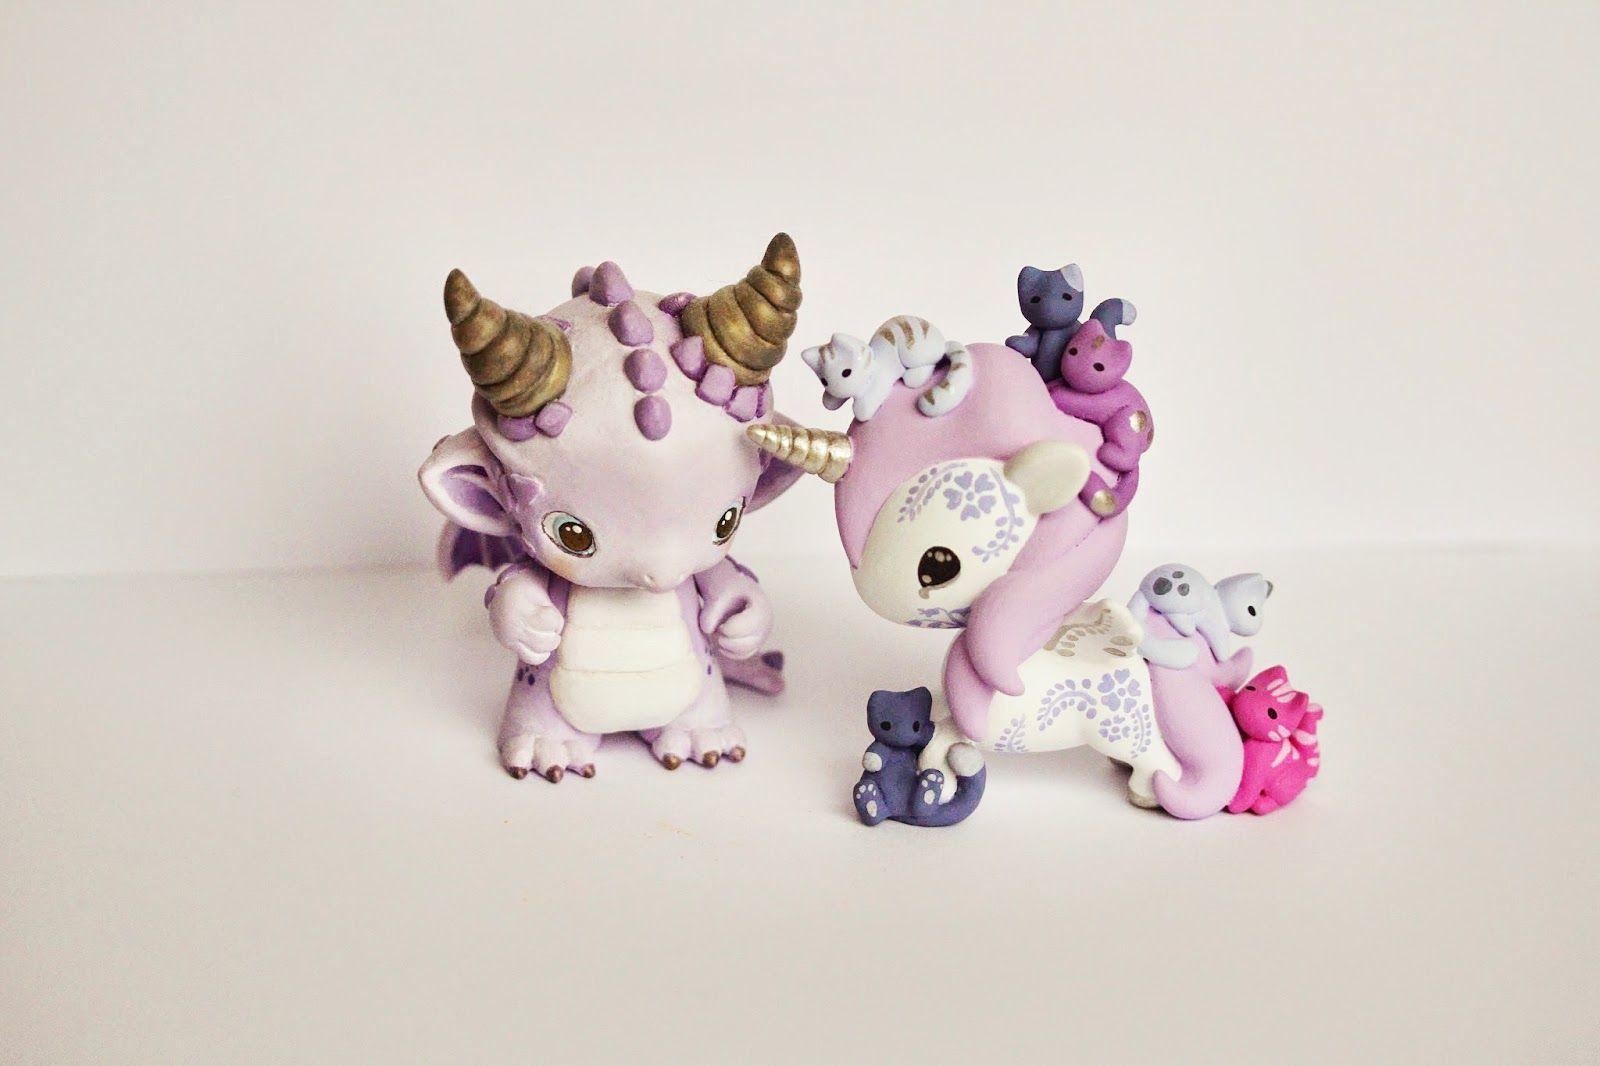 Mijbil Creatures: More kittens, more unicorns, more flowers!